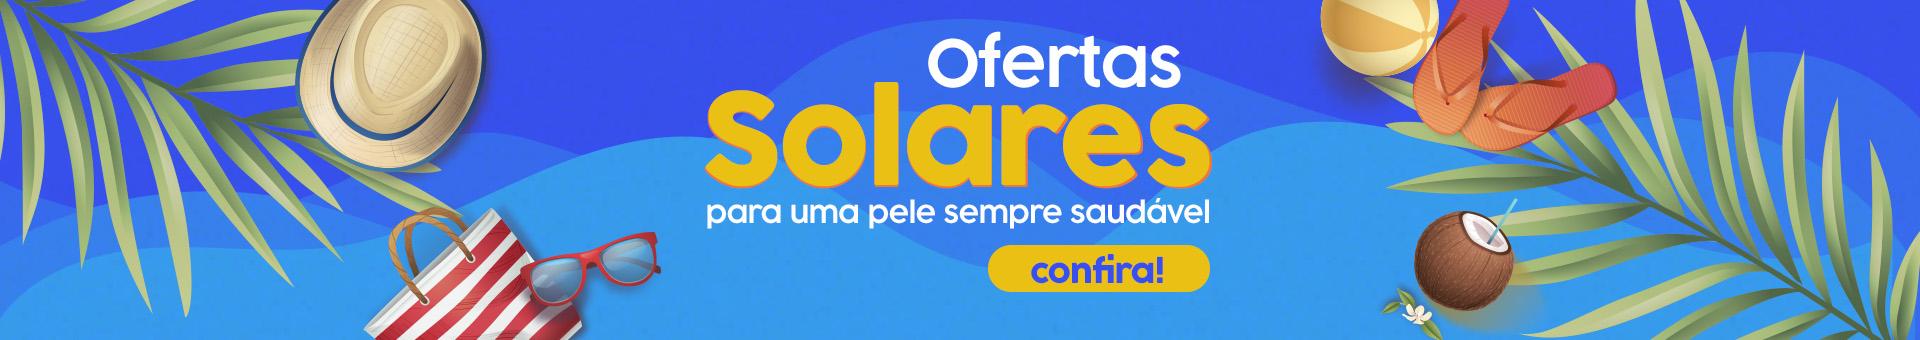 Banner Solares